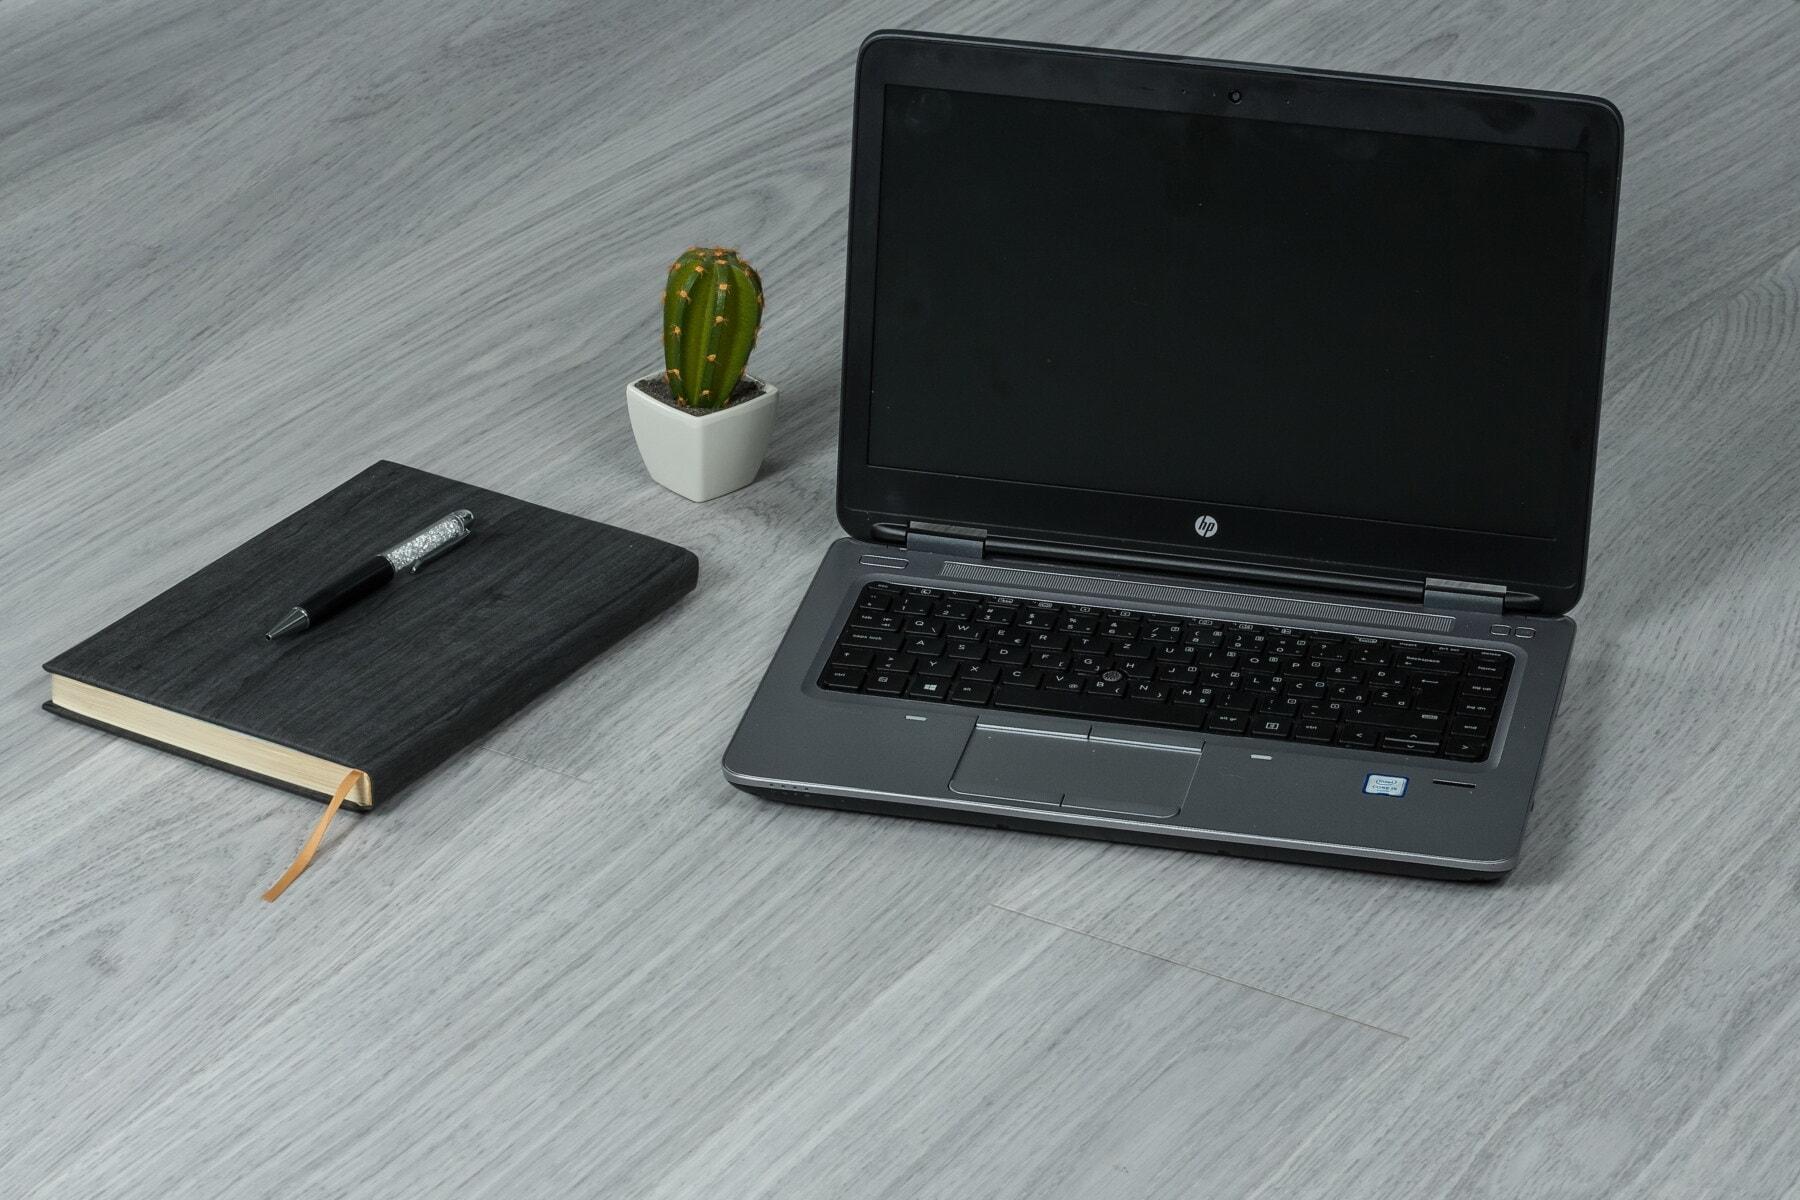 projeto, minimalismo, computador portátil, escritório, vaso de flor, lápis, caderno, cacto, computador, computador portátil